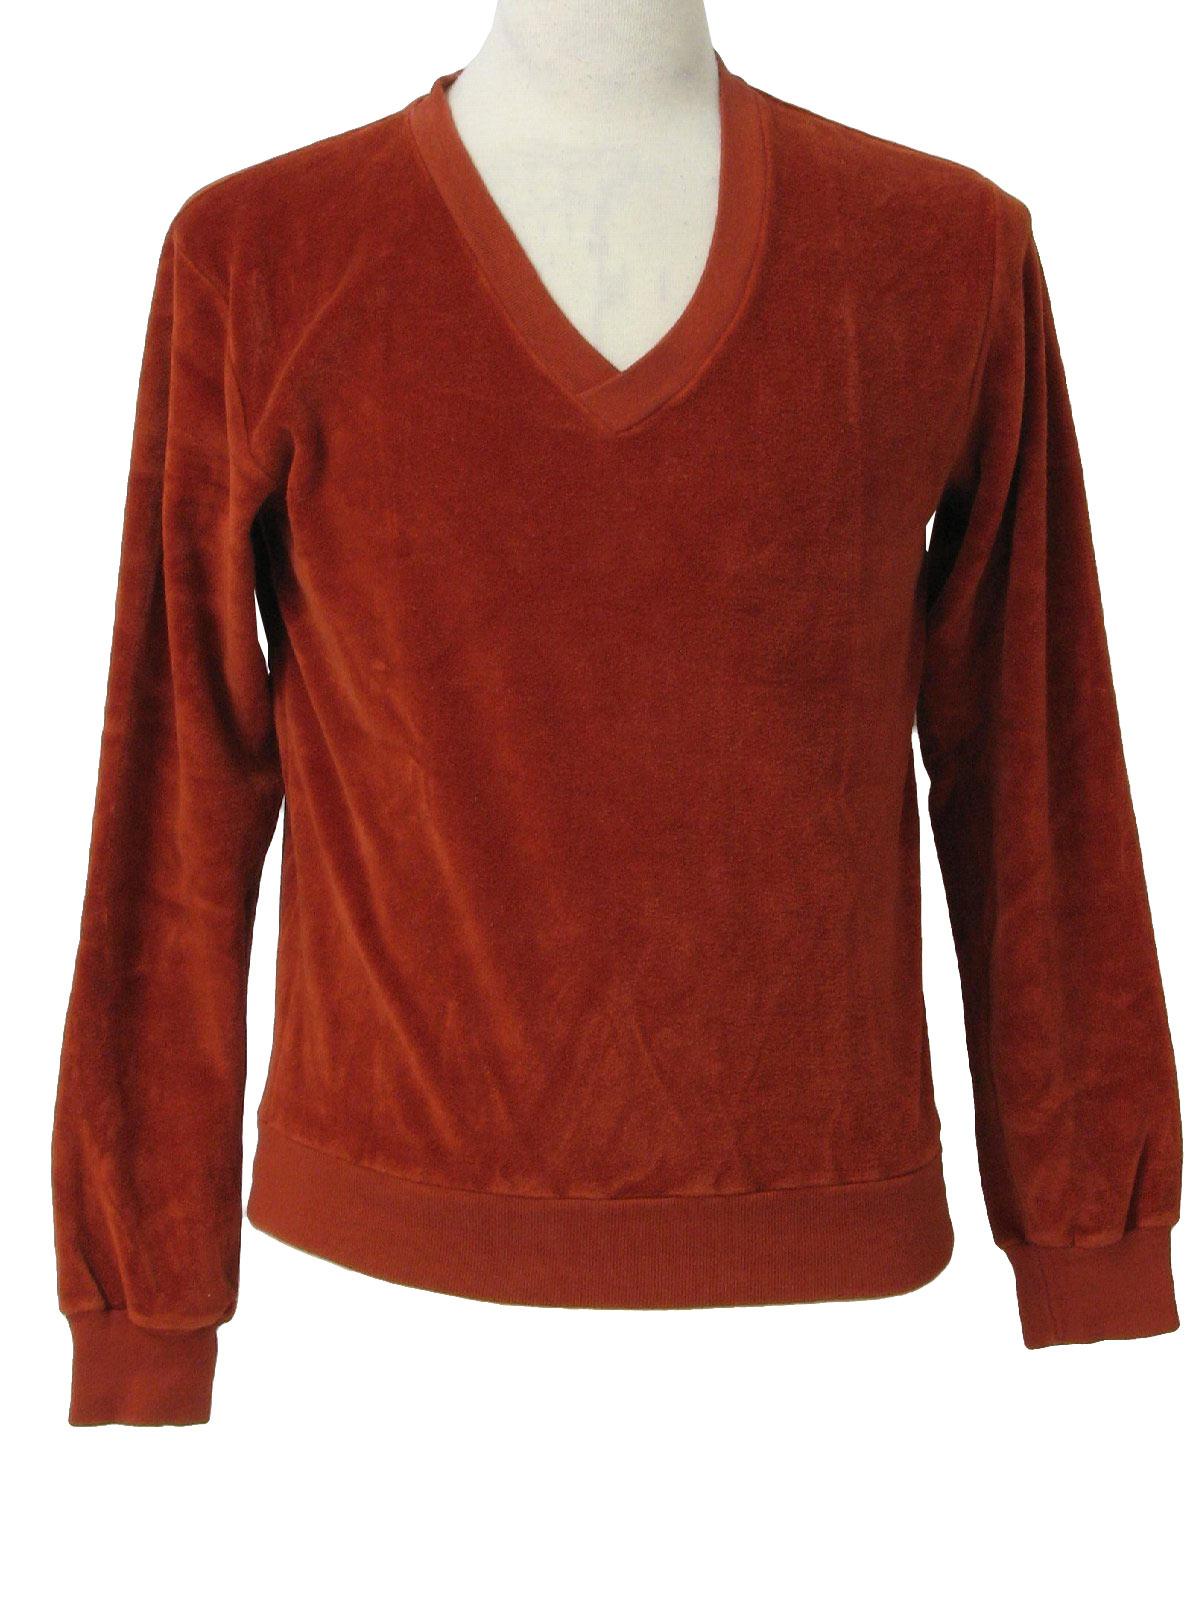 Vintage Hahne 70 S Velour Shirt Late 70s Hahne Mens